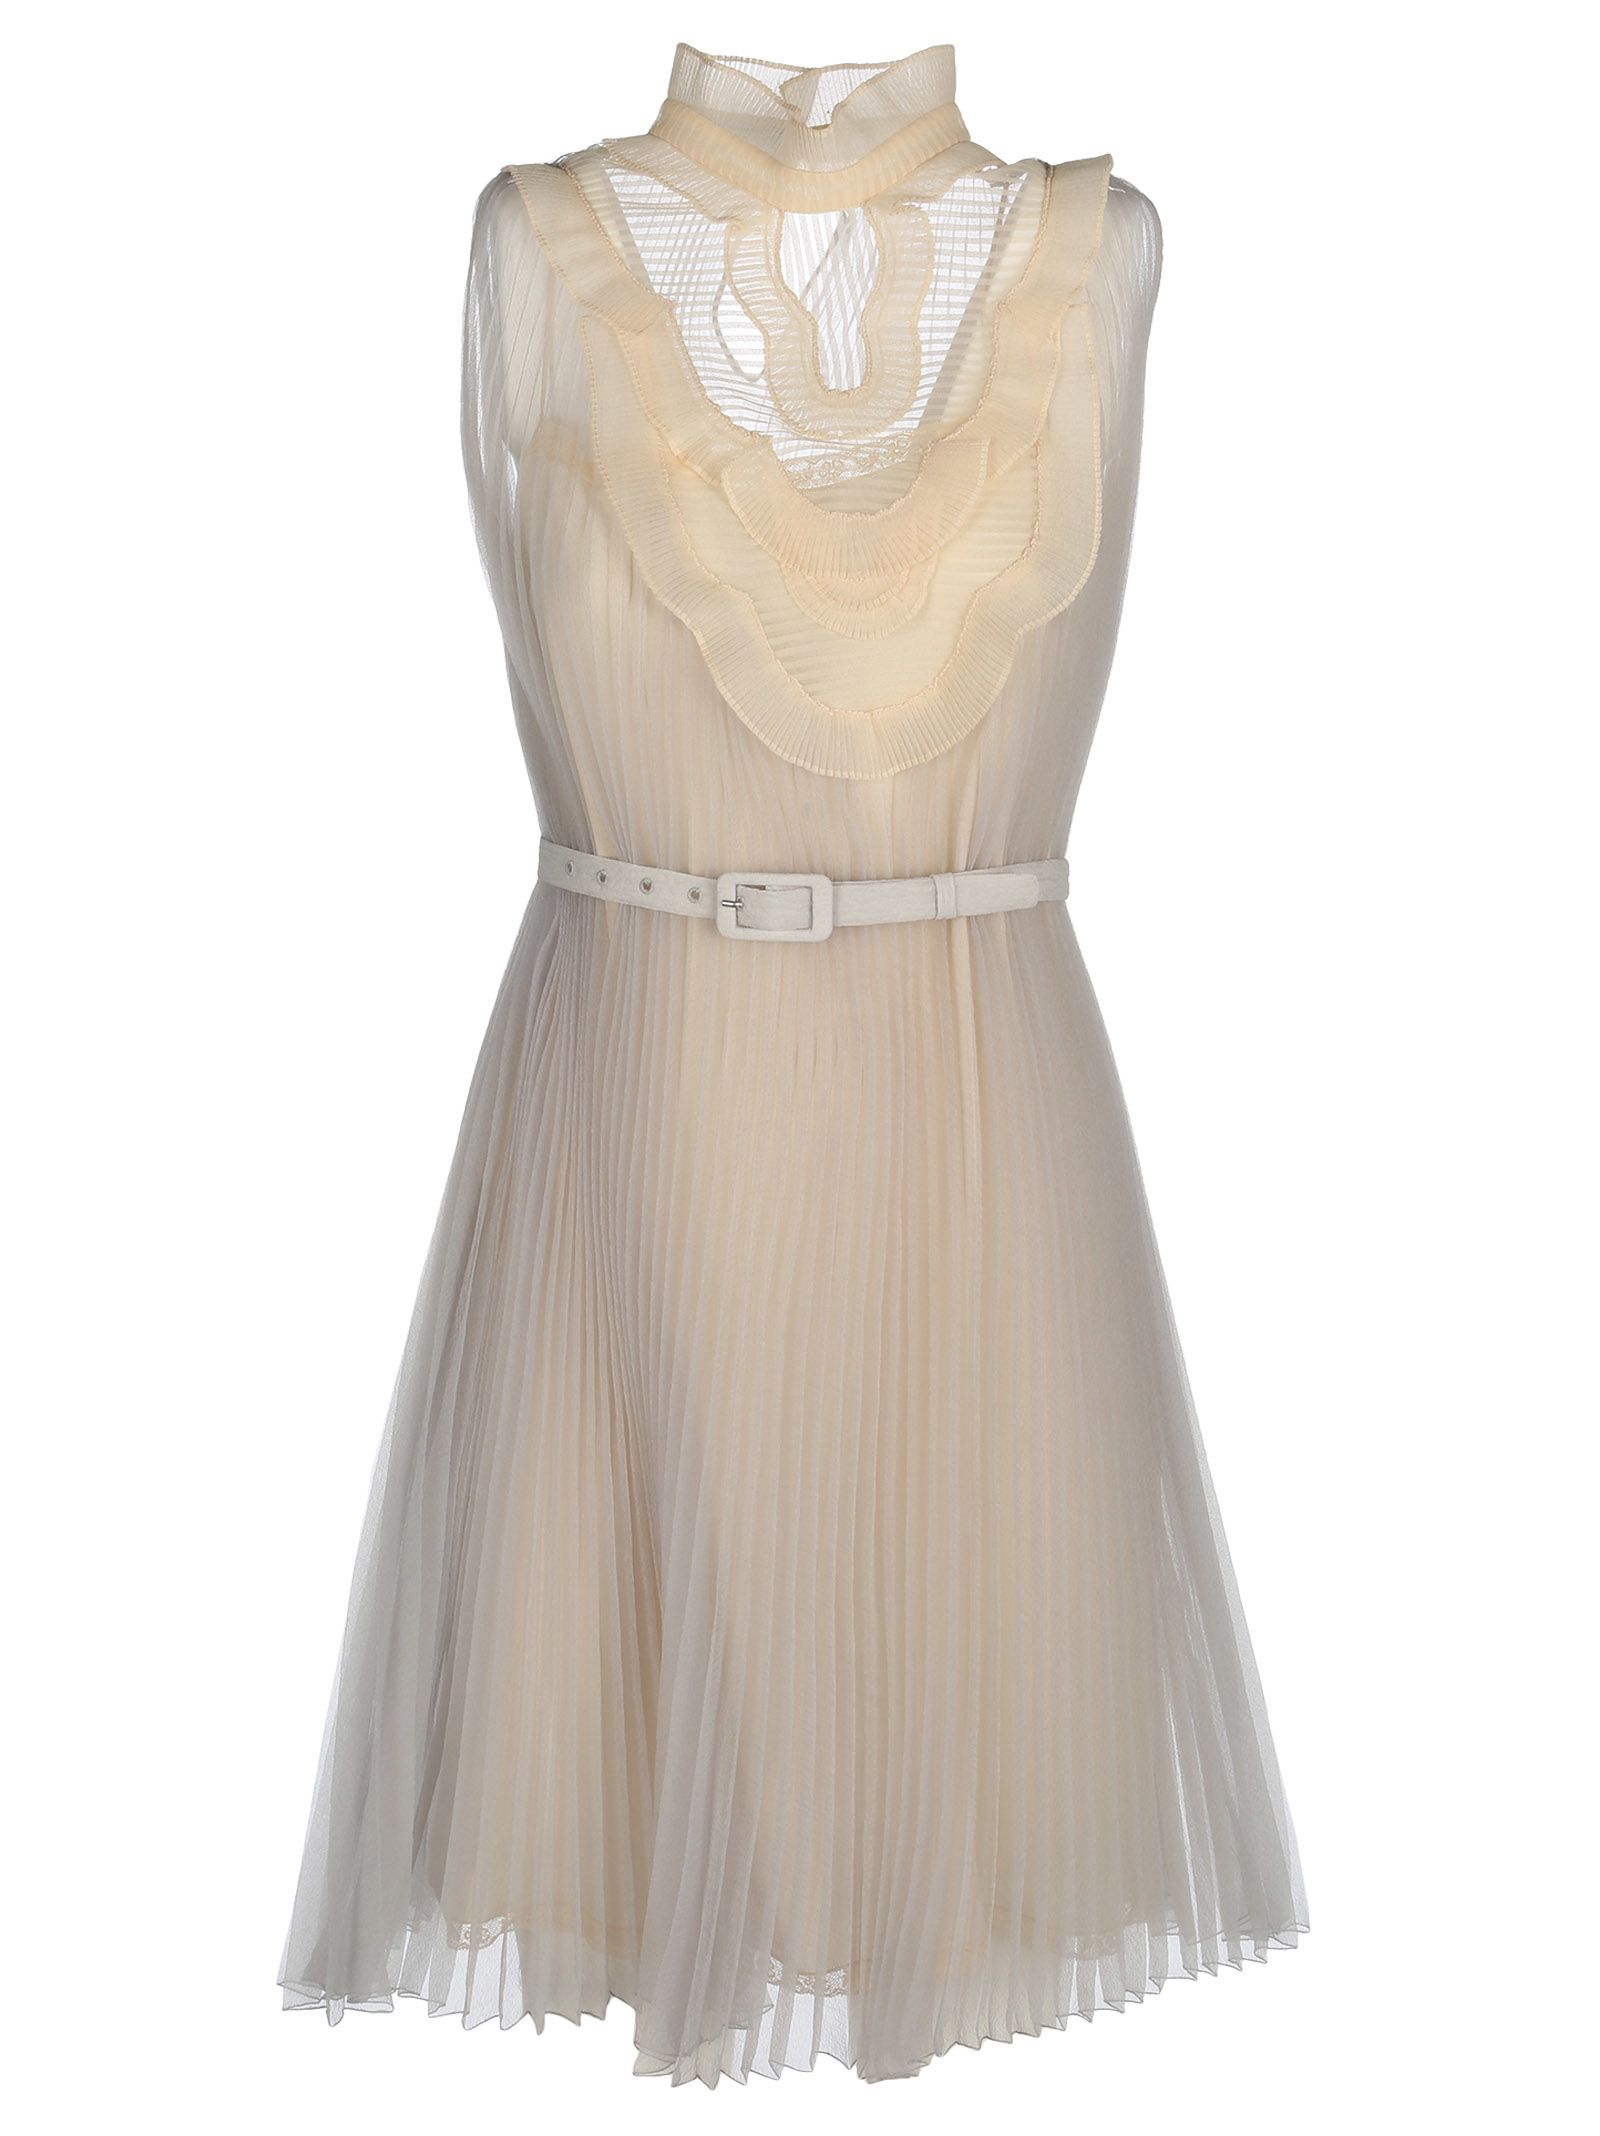 Prada Belted Pleated Dress